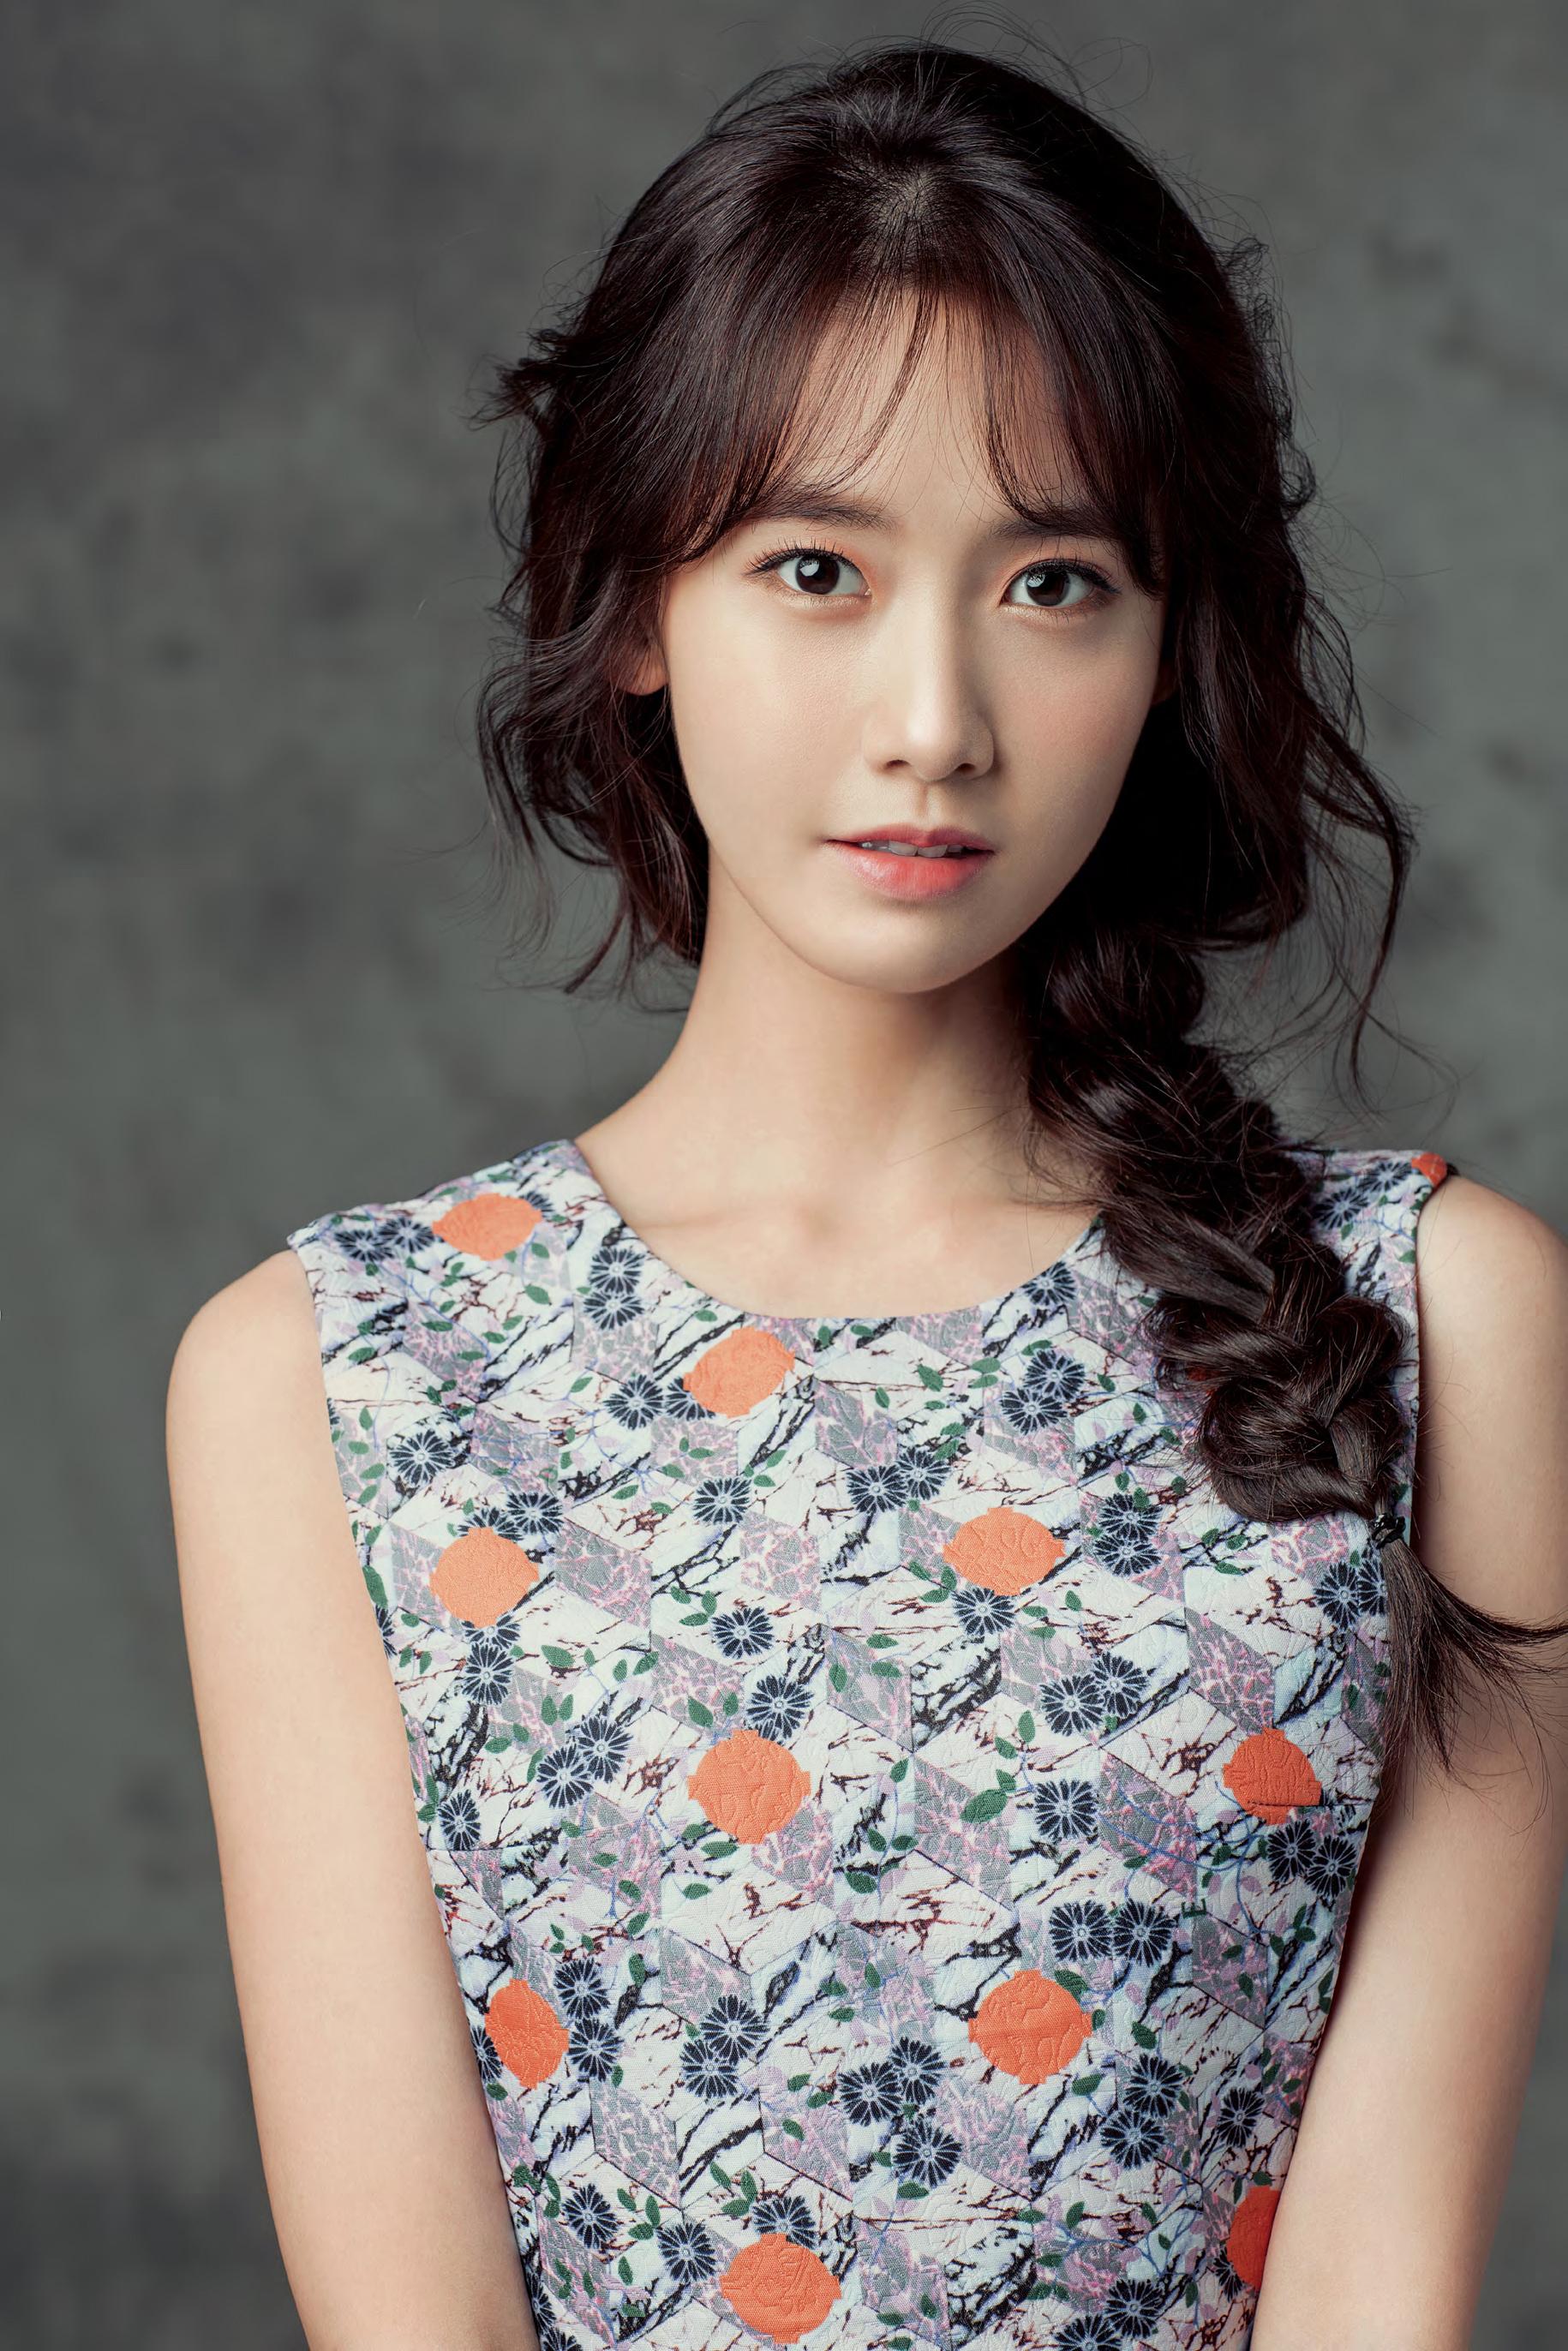 Yoona For Elle Korea April 2015 Im Yoona Photo 38214893